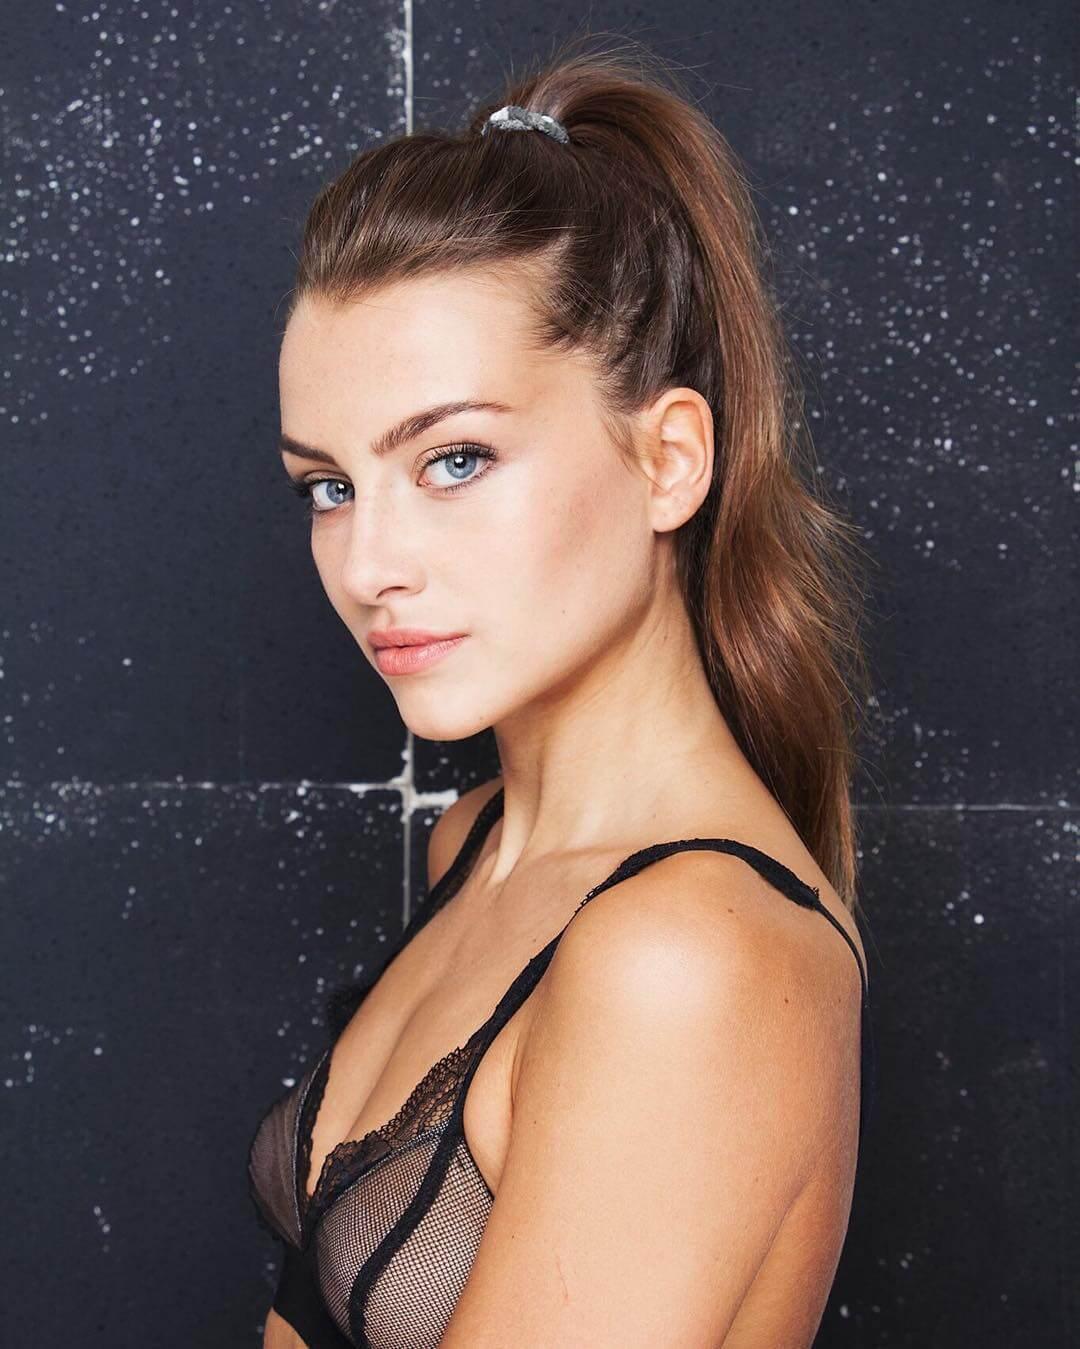 Stephanie Geldhof